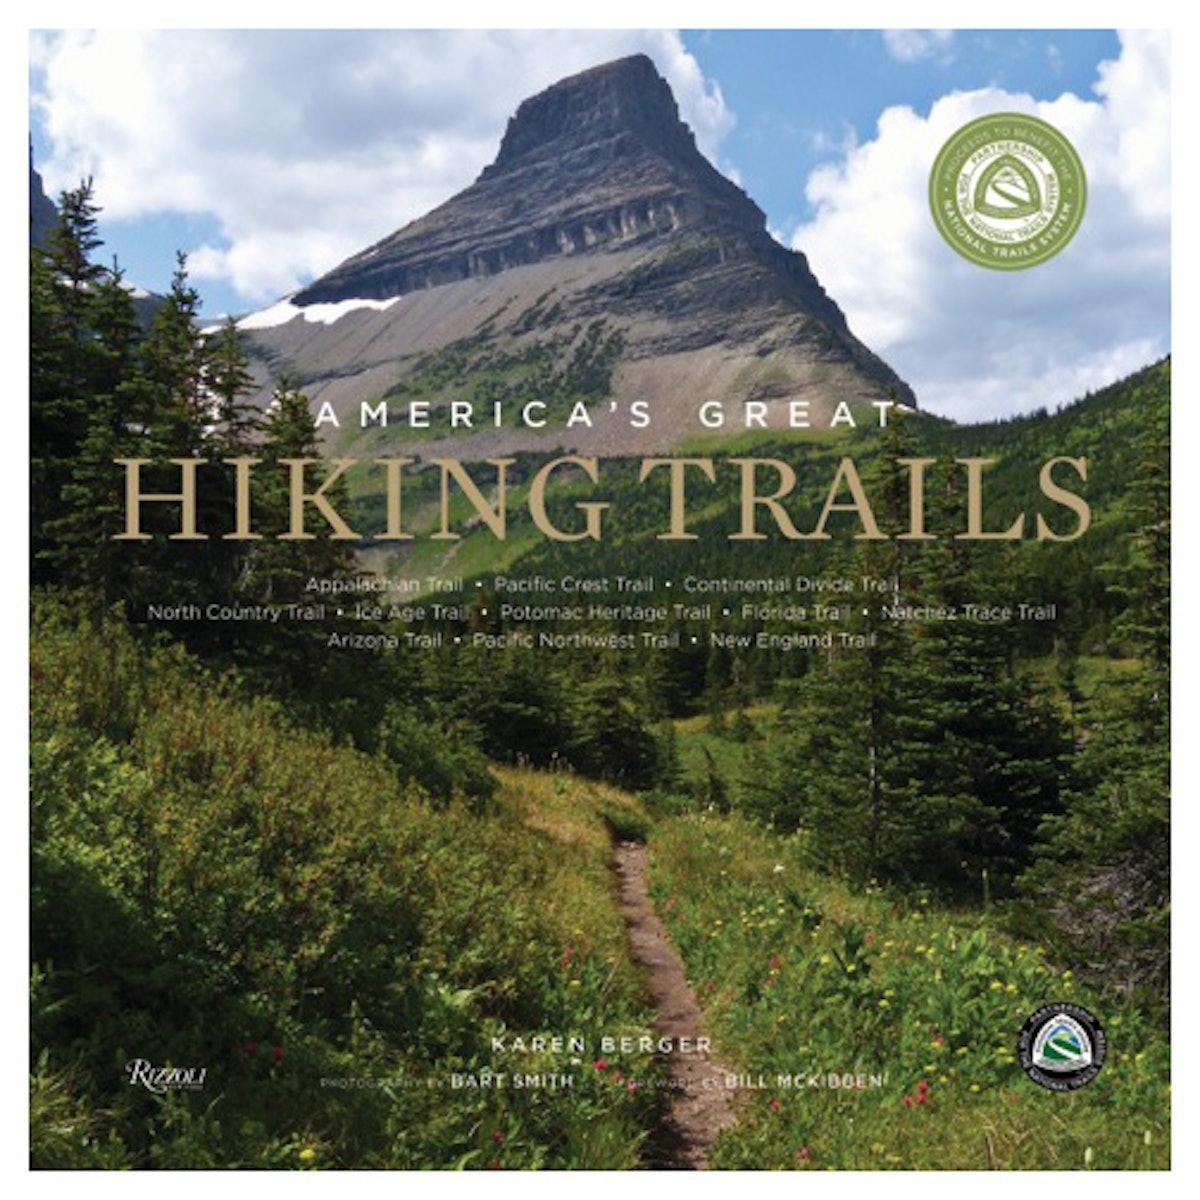 America's Great Hiking Trails,